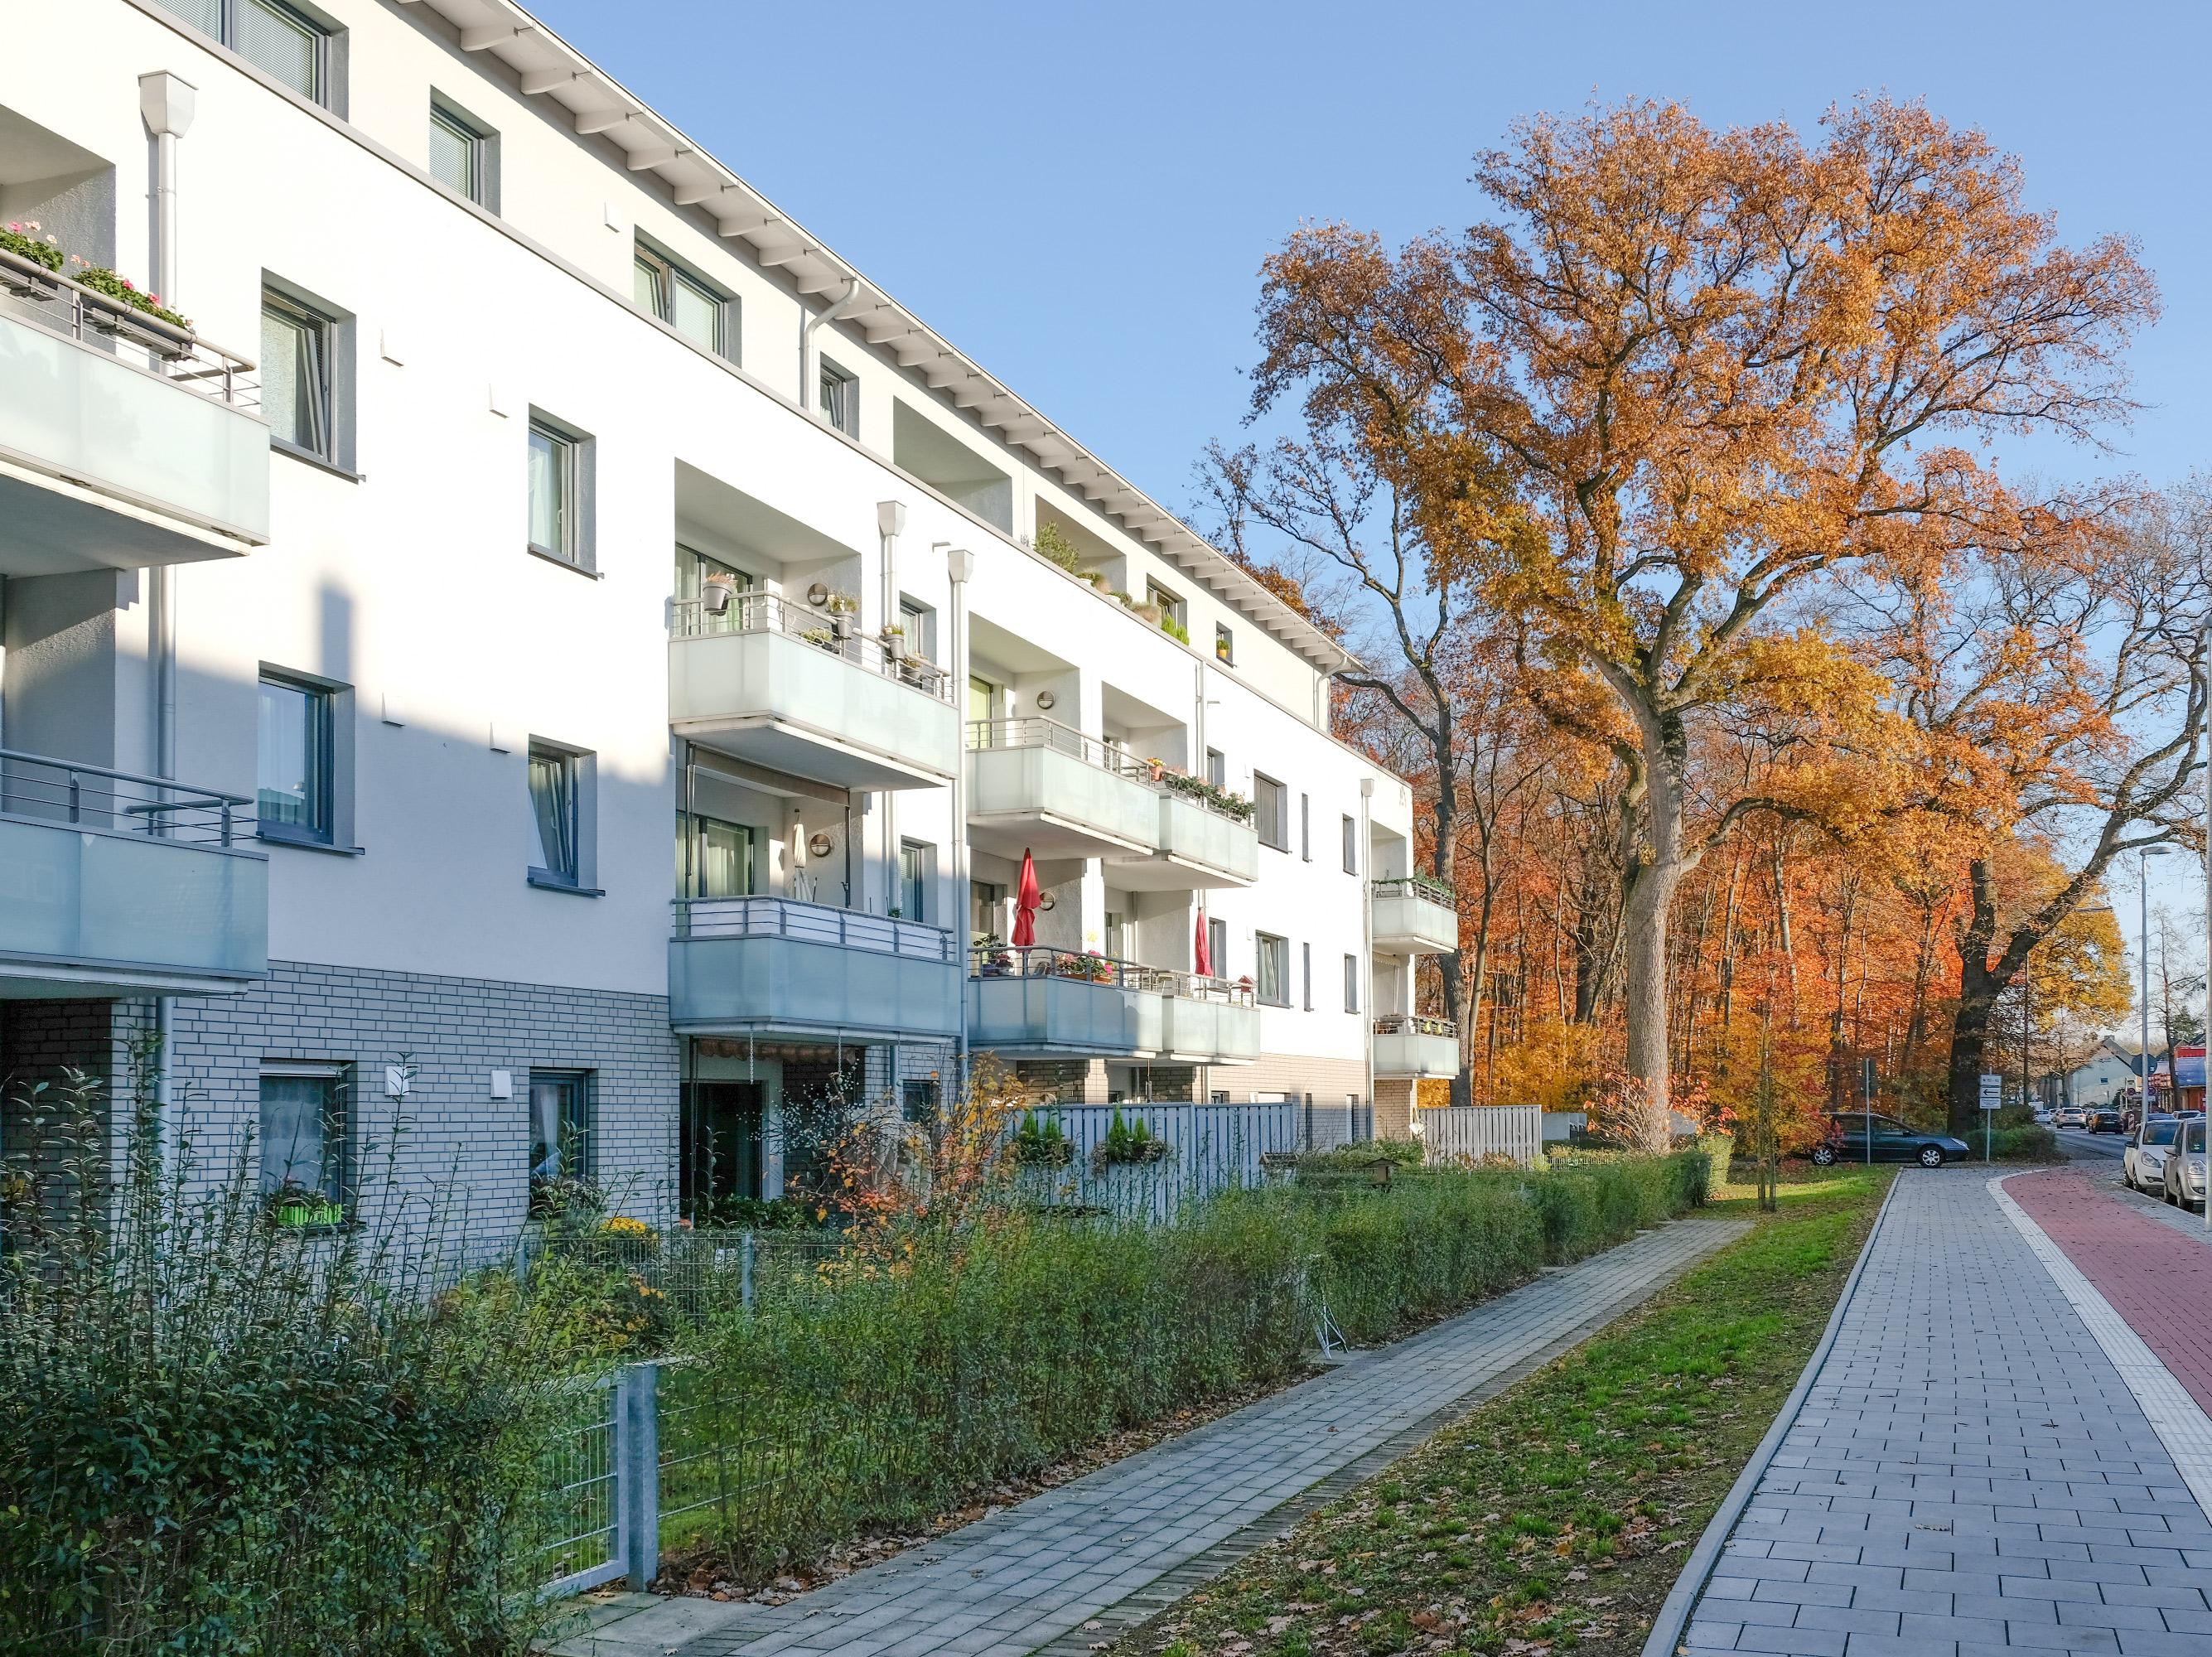 Am Schönenkamp, Düsseldorf